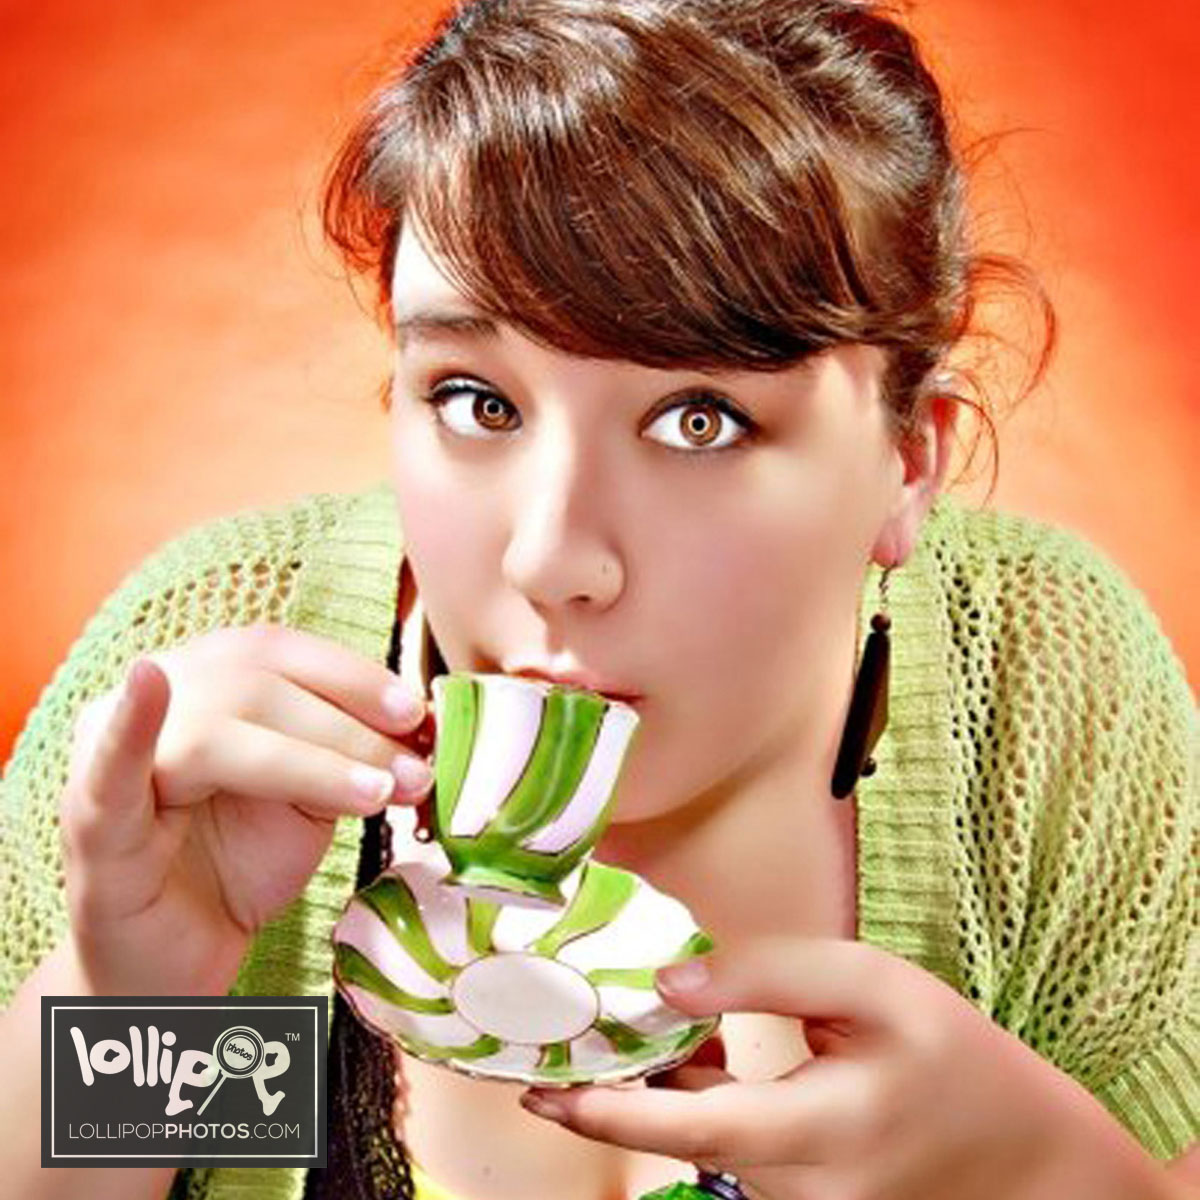 msdig-nora-canfield-lollipop-photos-123.jpg